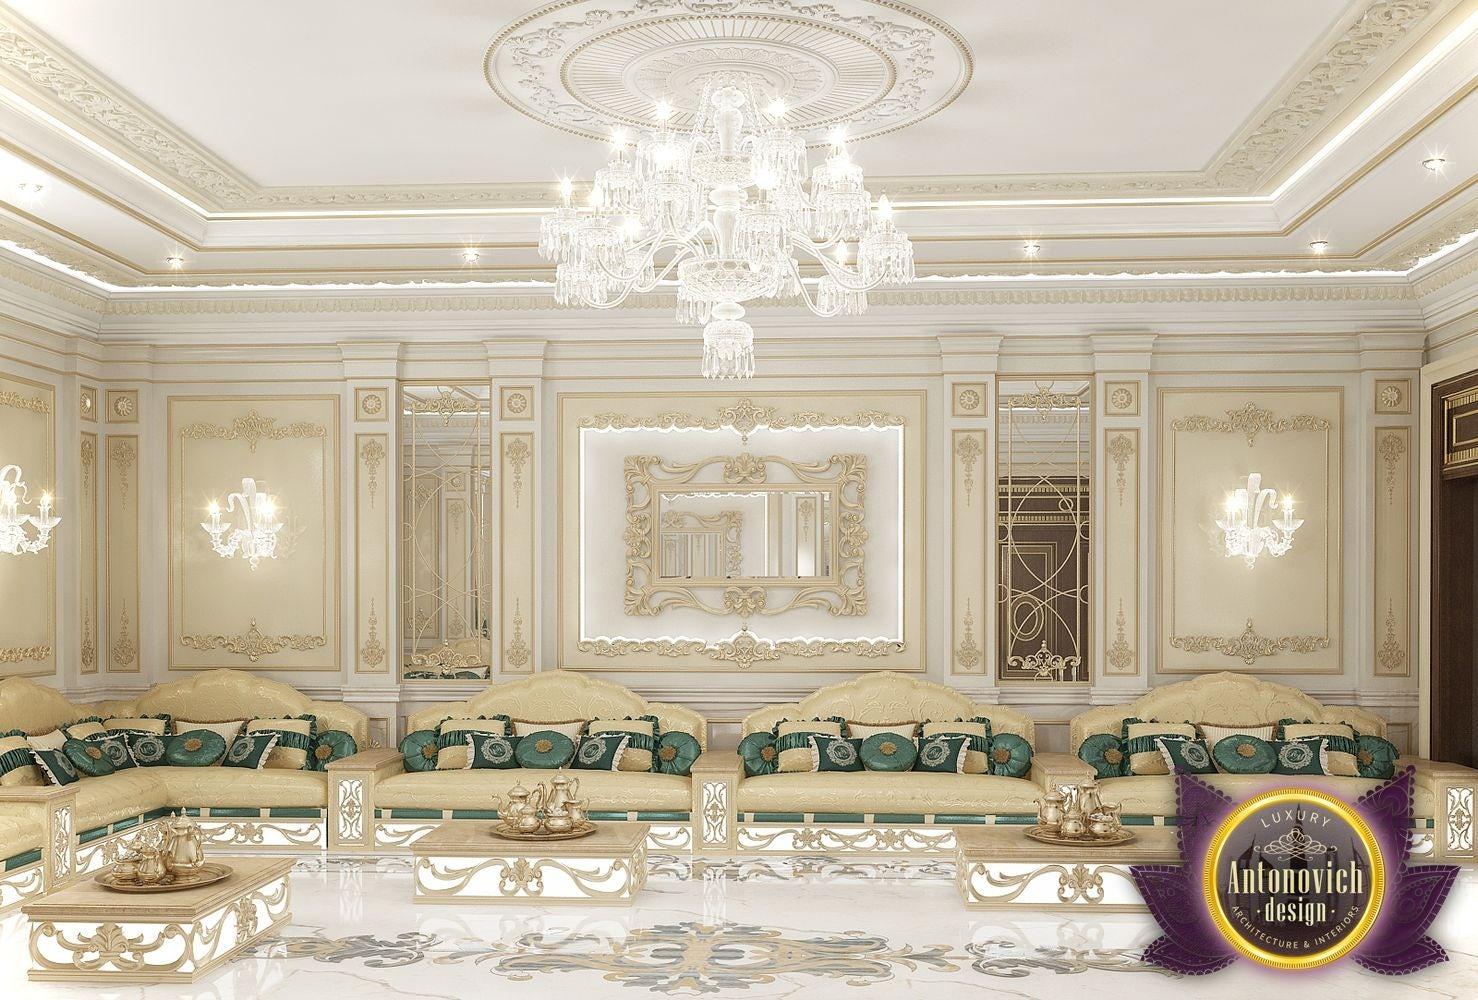 Arabic Majlis Interior Design Delectable Arabic Majlis Interior Design From Luxury Antonovich Design On . Inspiration Design